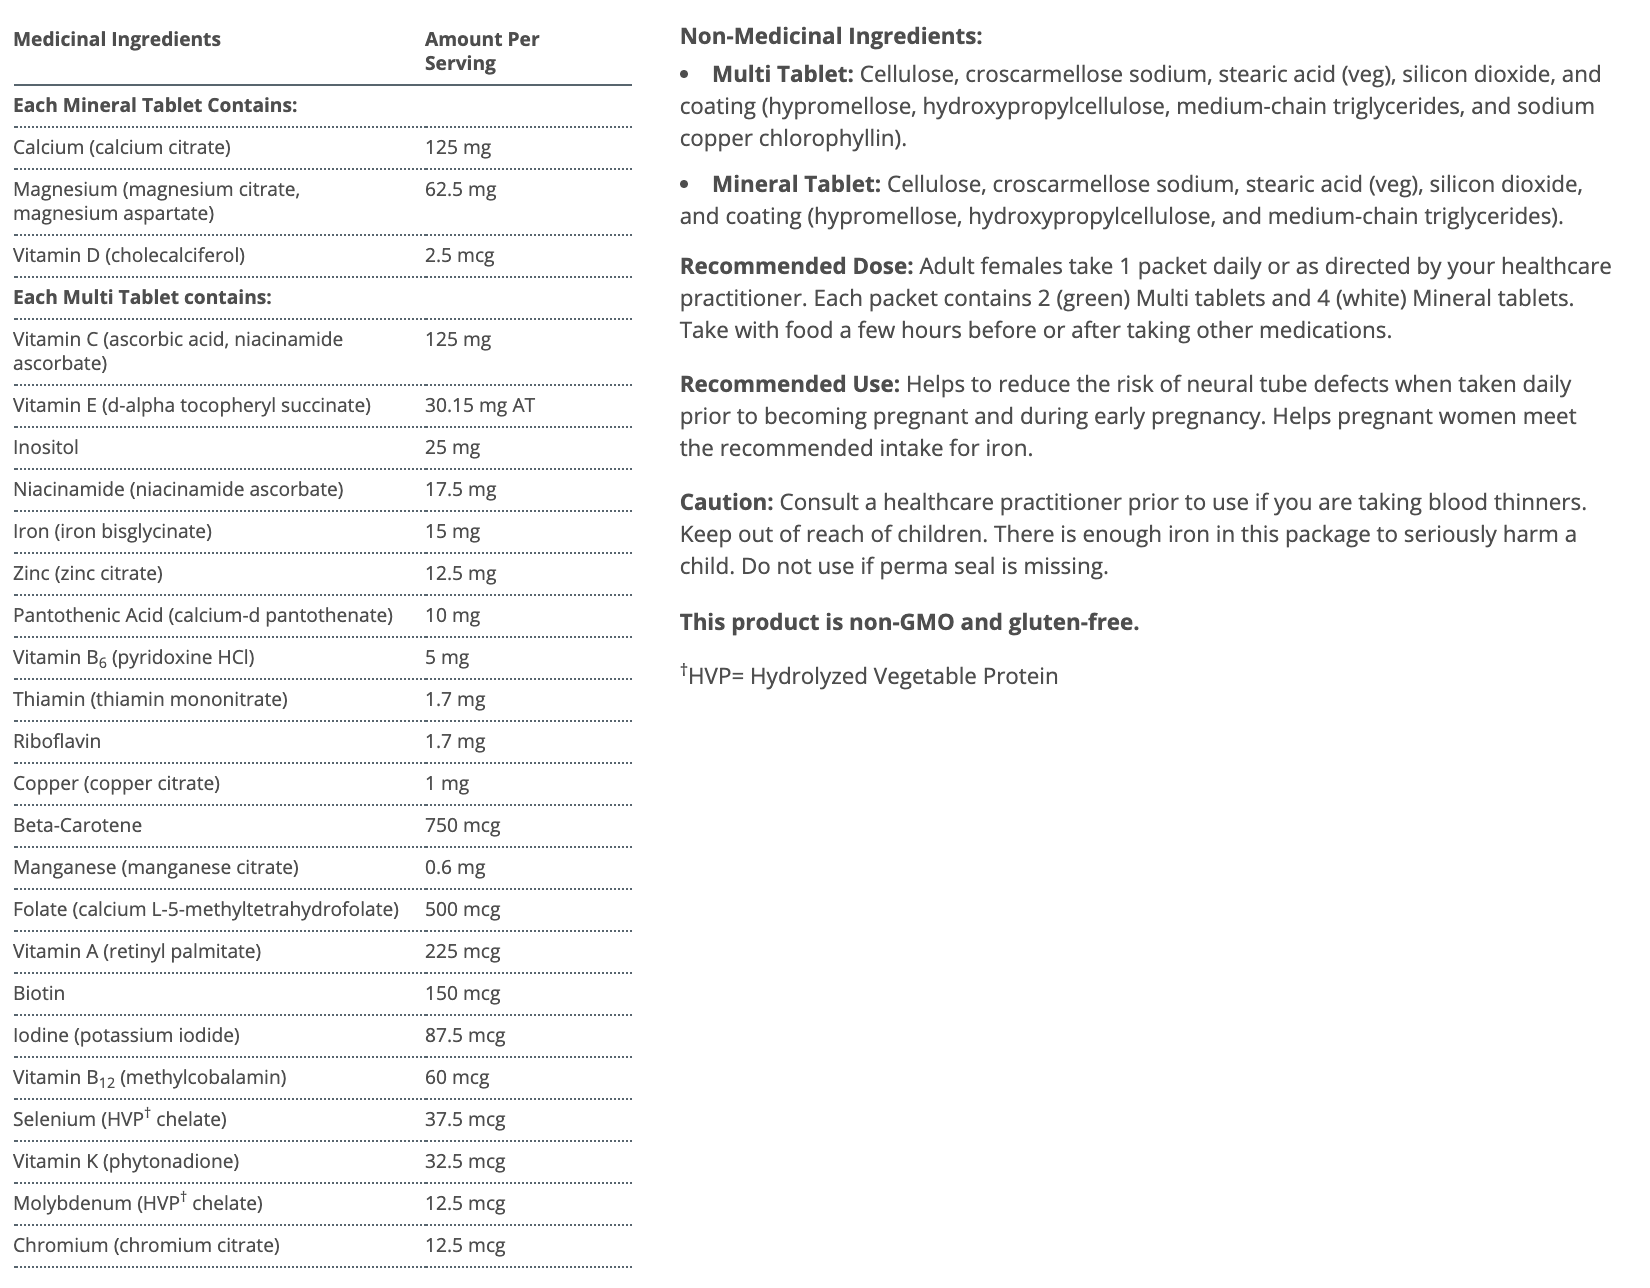 Metagenics Fem Prenatal 30 Packets Canada Ingredients